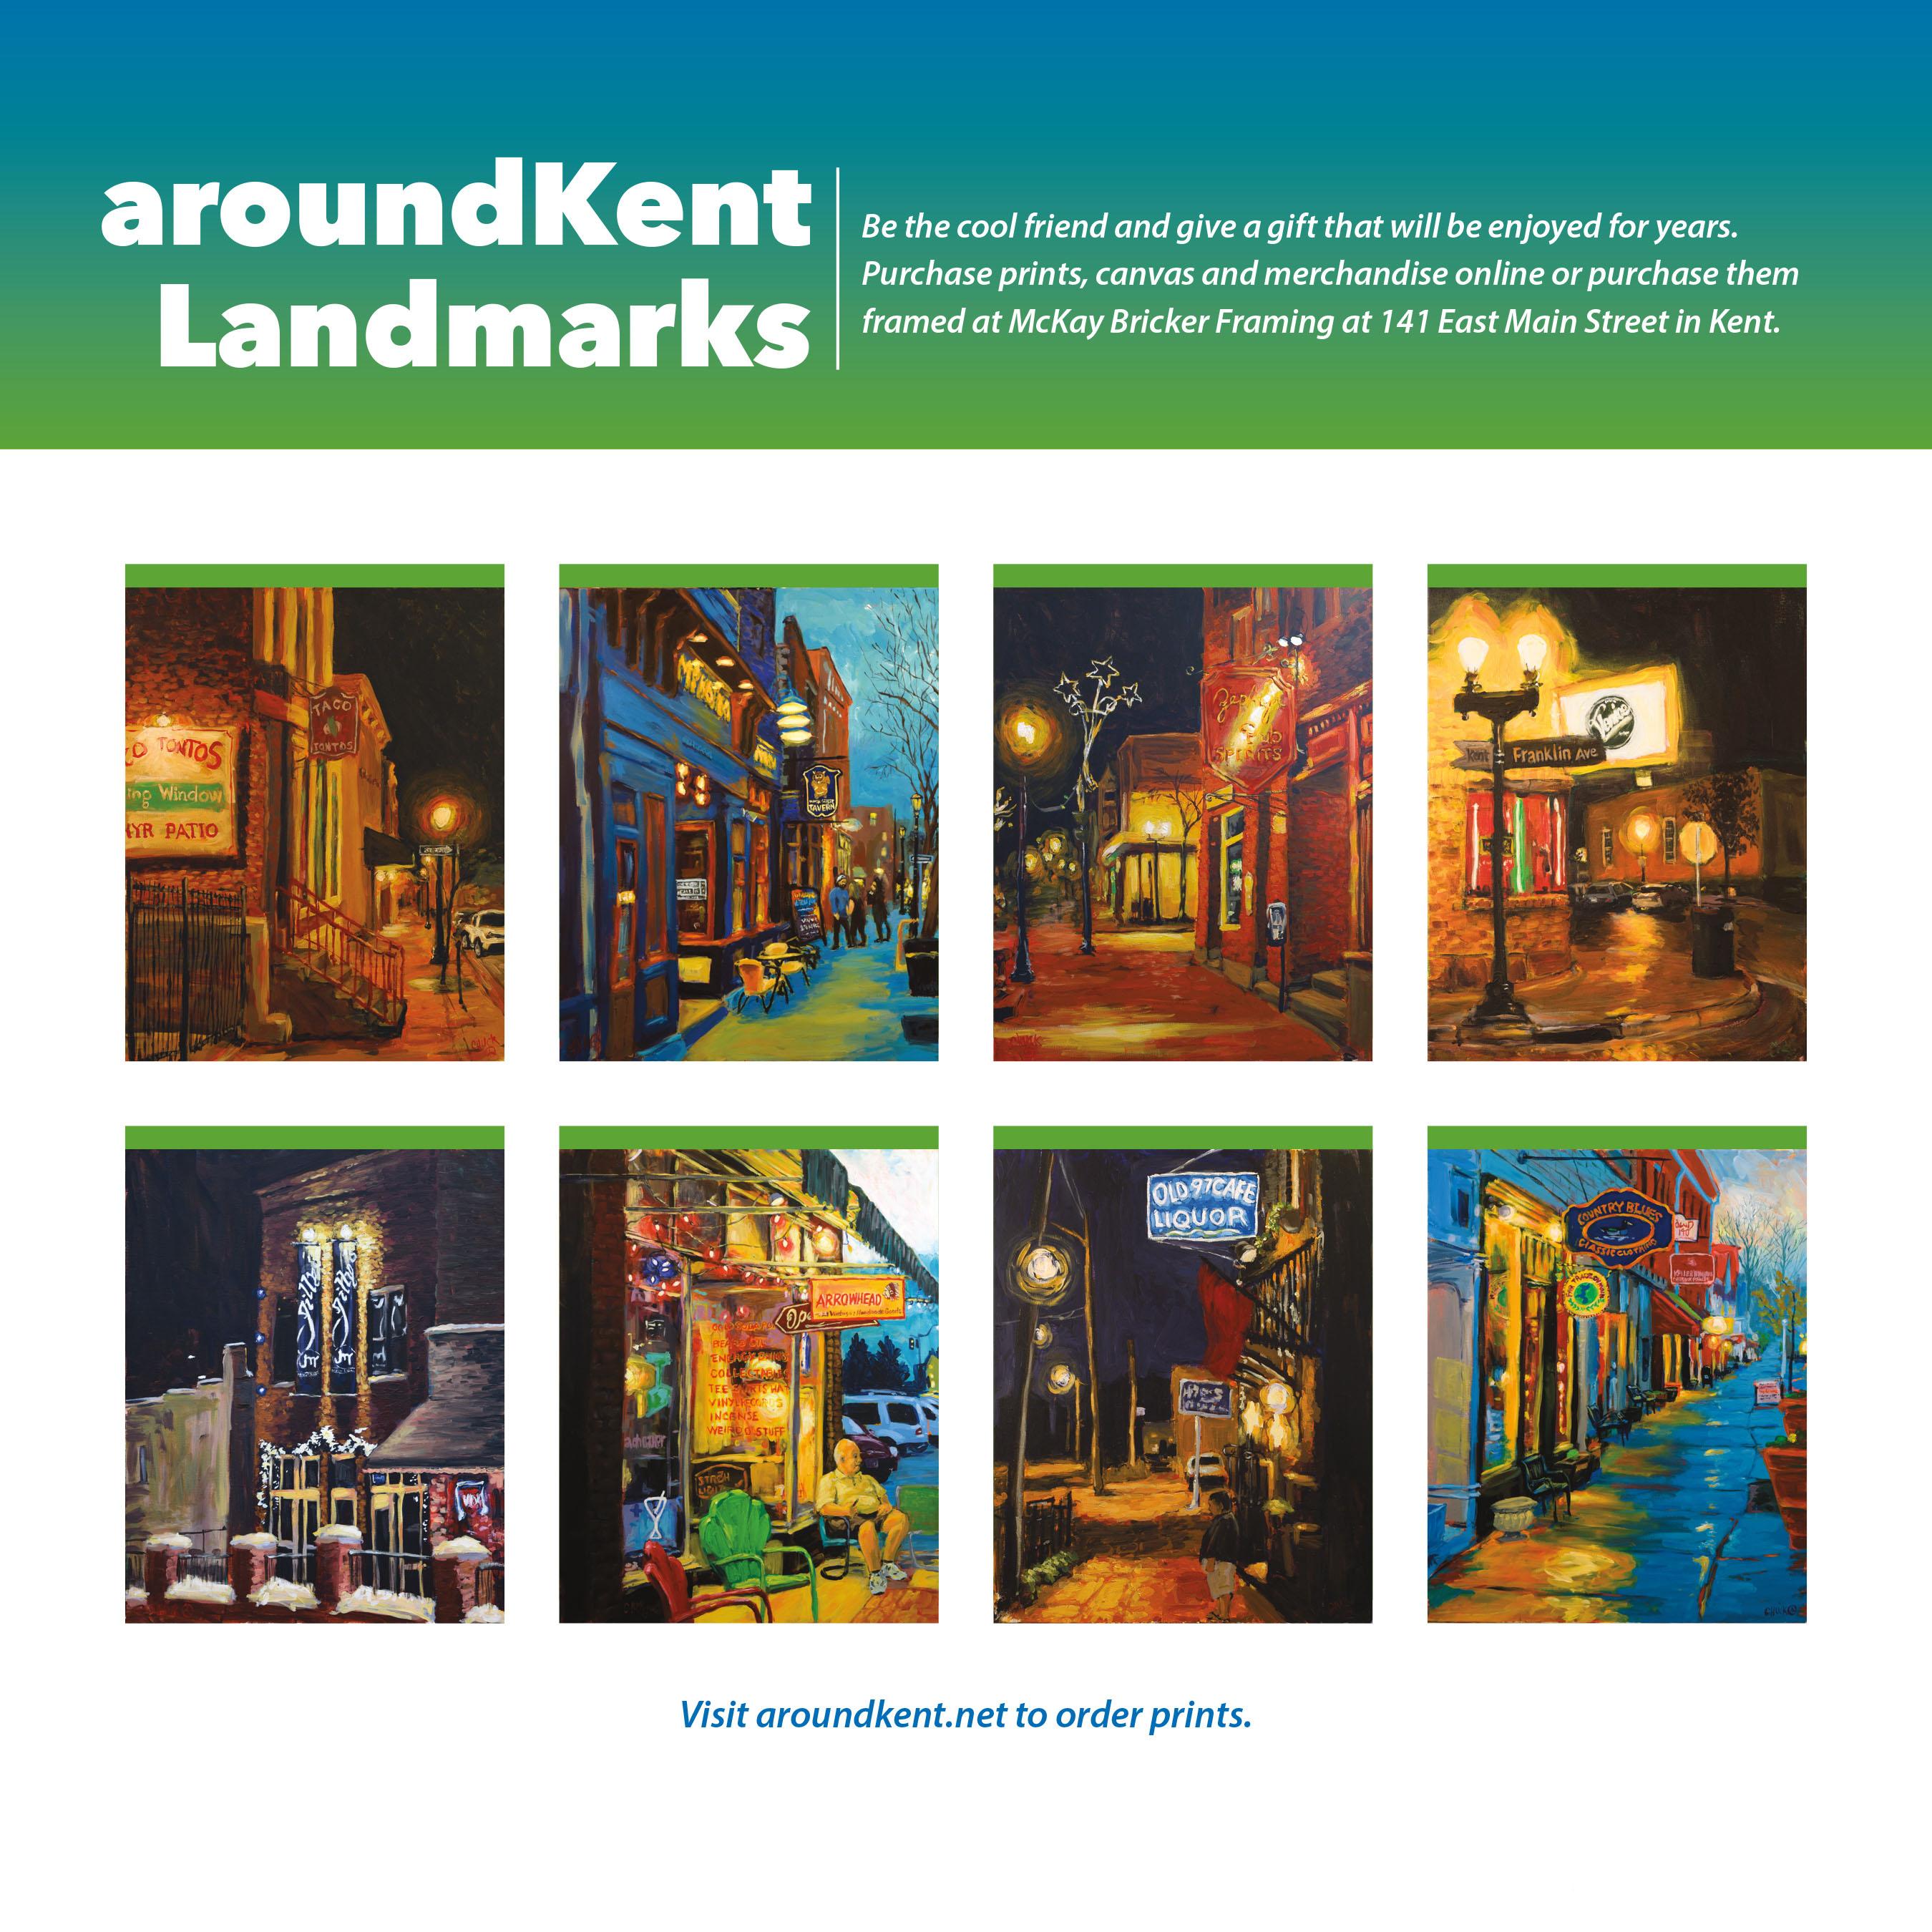 aroundKent Landmarks